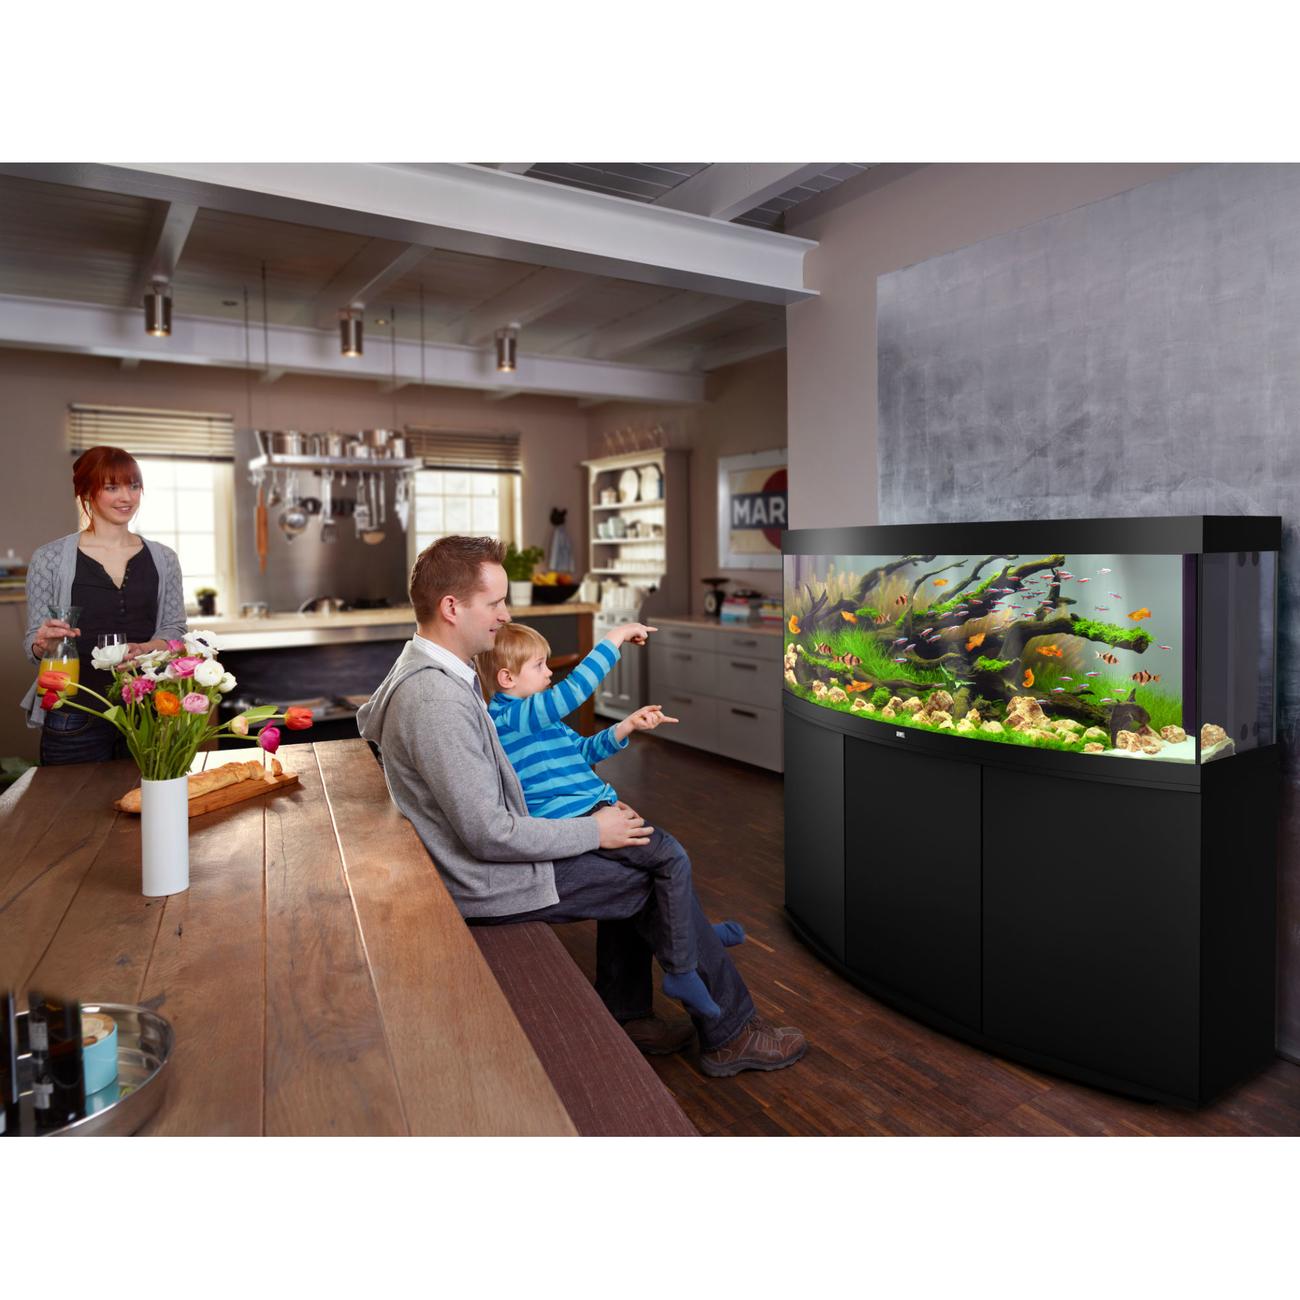 JUWEL Vision 450 LED Aquarium mit Unterschrank Bild 4